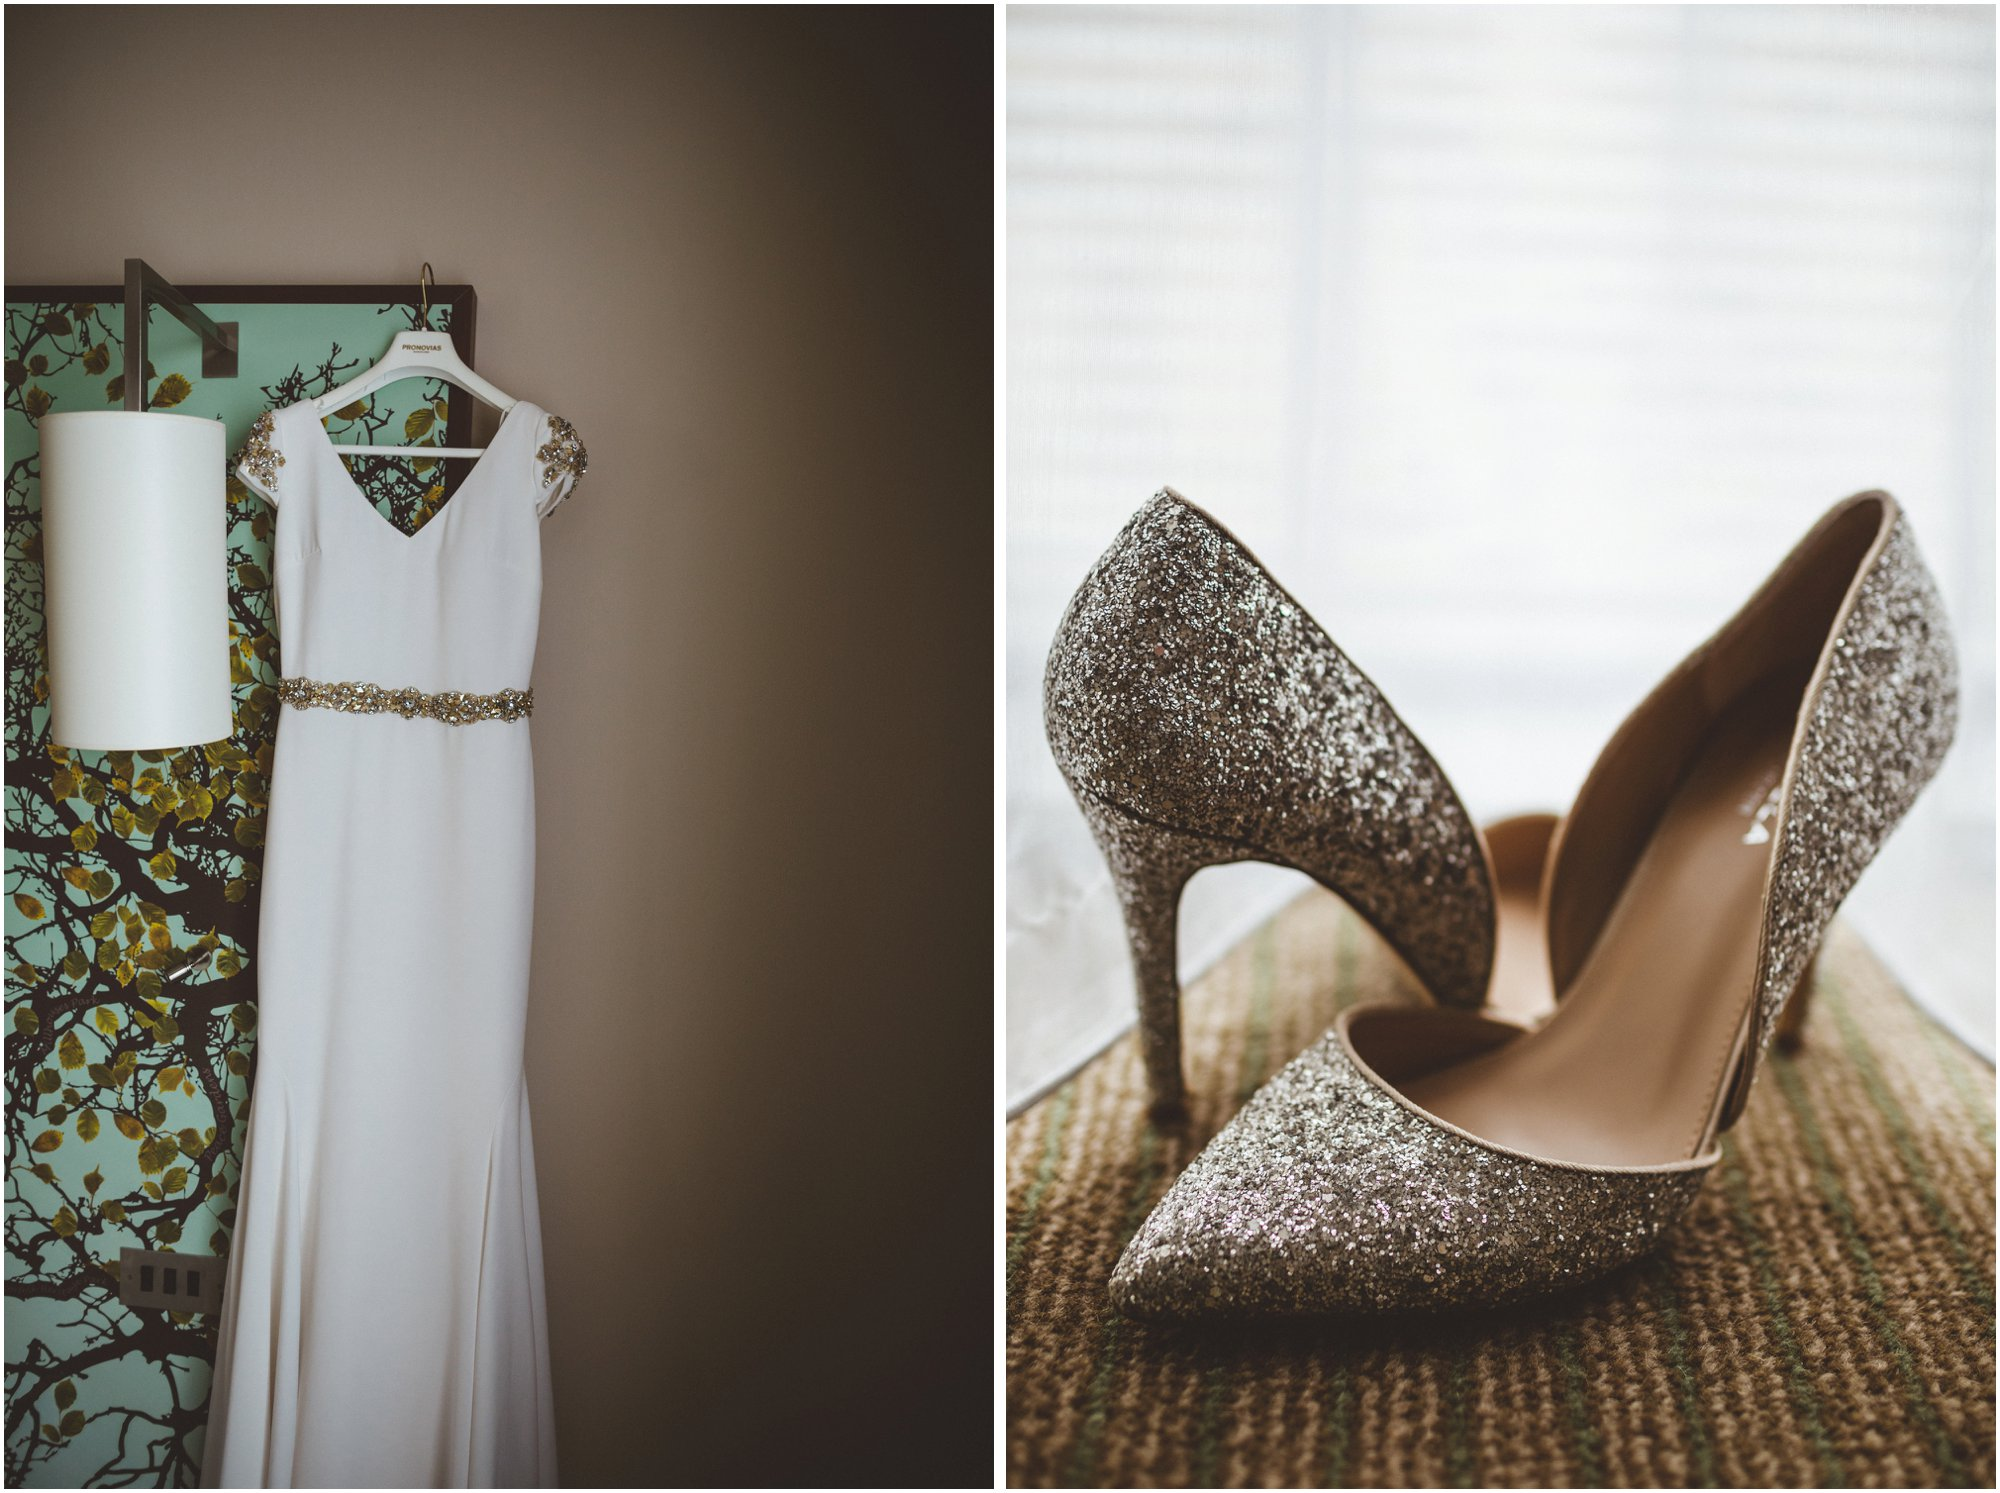 pronovias-wedding-dress_0002.jpg